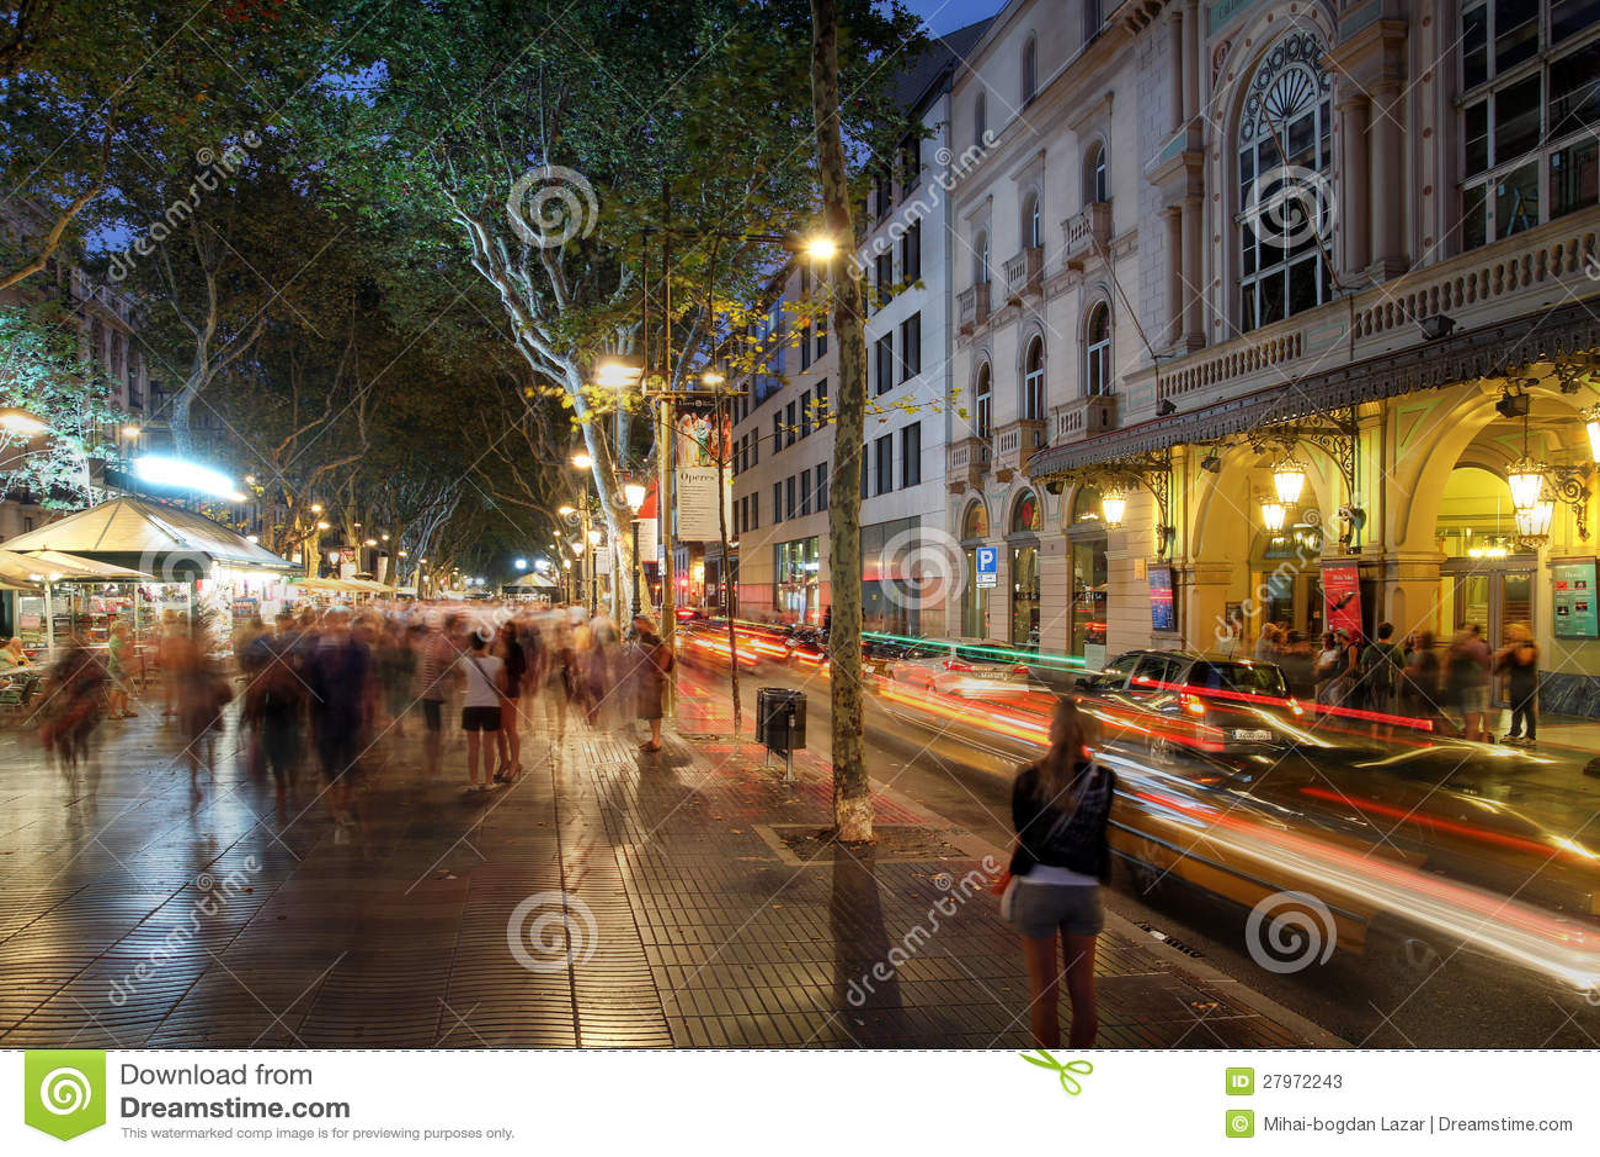 La Rambla, Barcelona, Spain Editorial Stock Photo - Image: 27972243